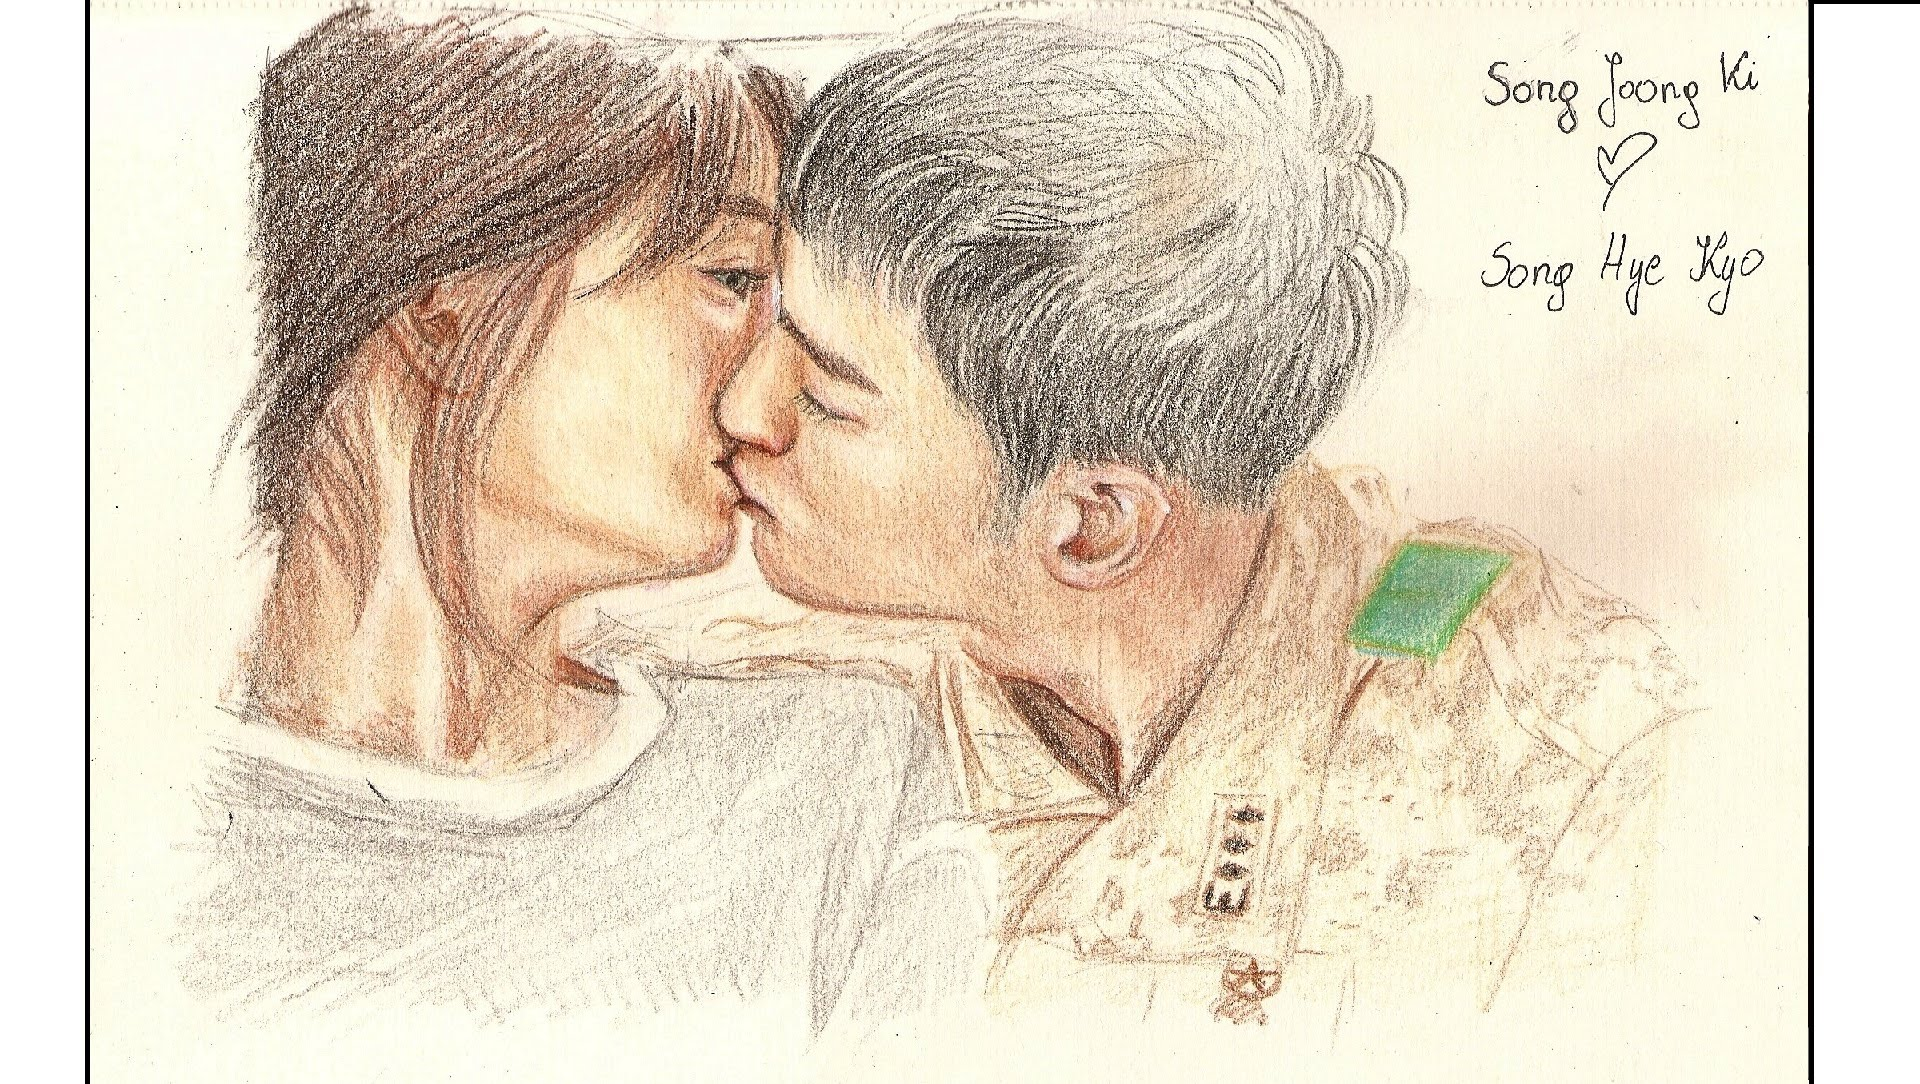 1920x1084 Song Joong Ki Kiss Song Hye Kyo Speed Drawing Descendants